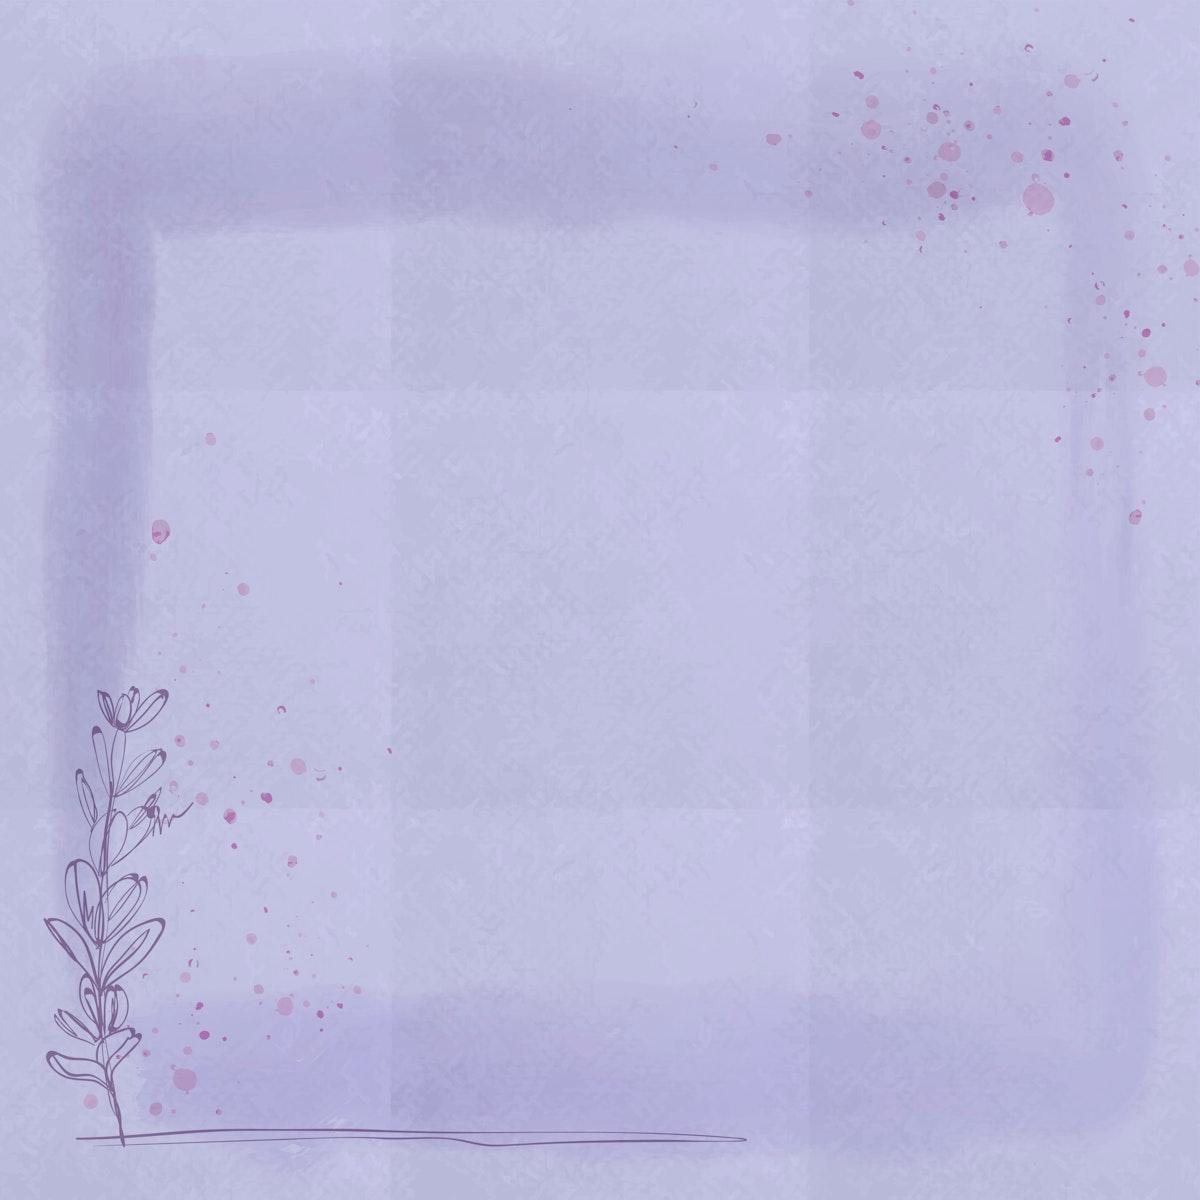 Purple floral square frame vector